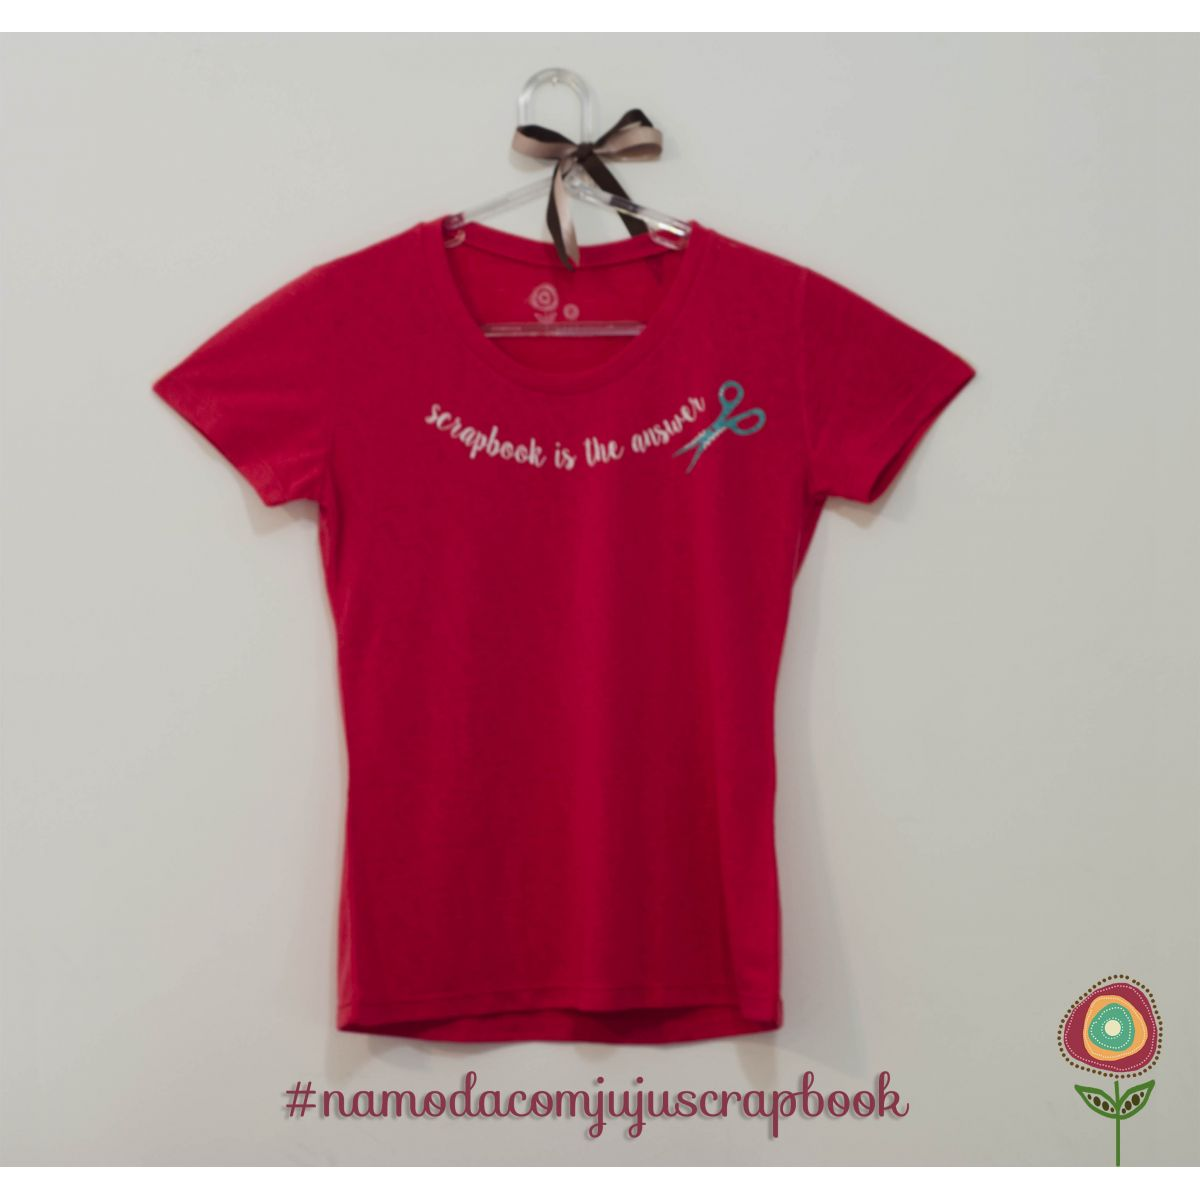 T-shirt Modelo Scrapbook is the Answer (cor melancia) - Coleção Love Scrap / JuJu Scrapbook  - JuJu Scrapbook